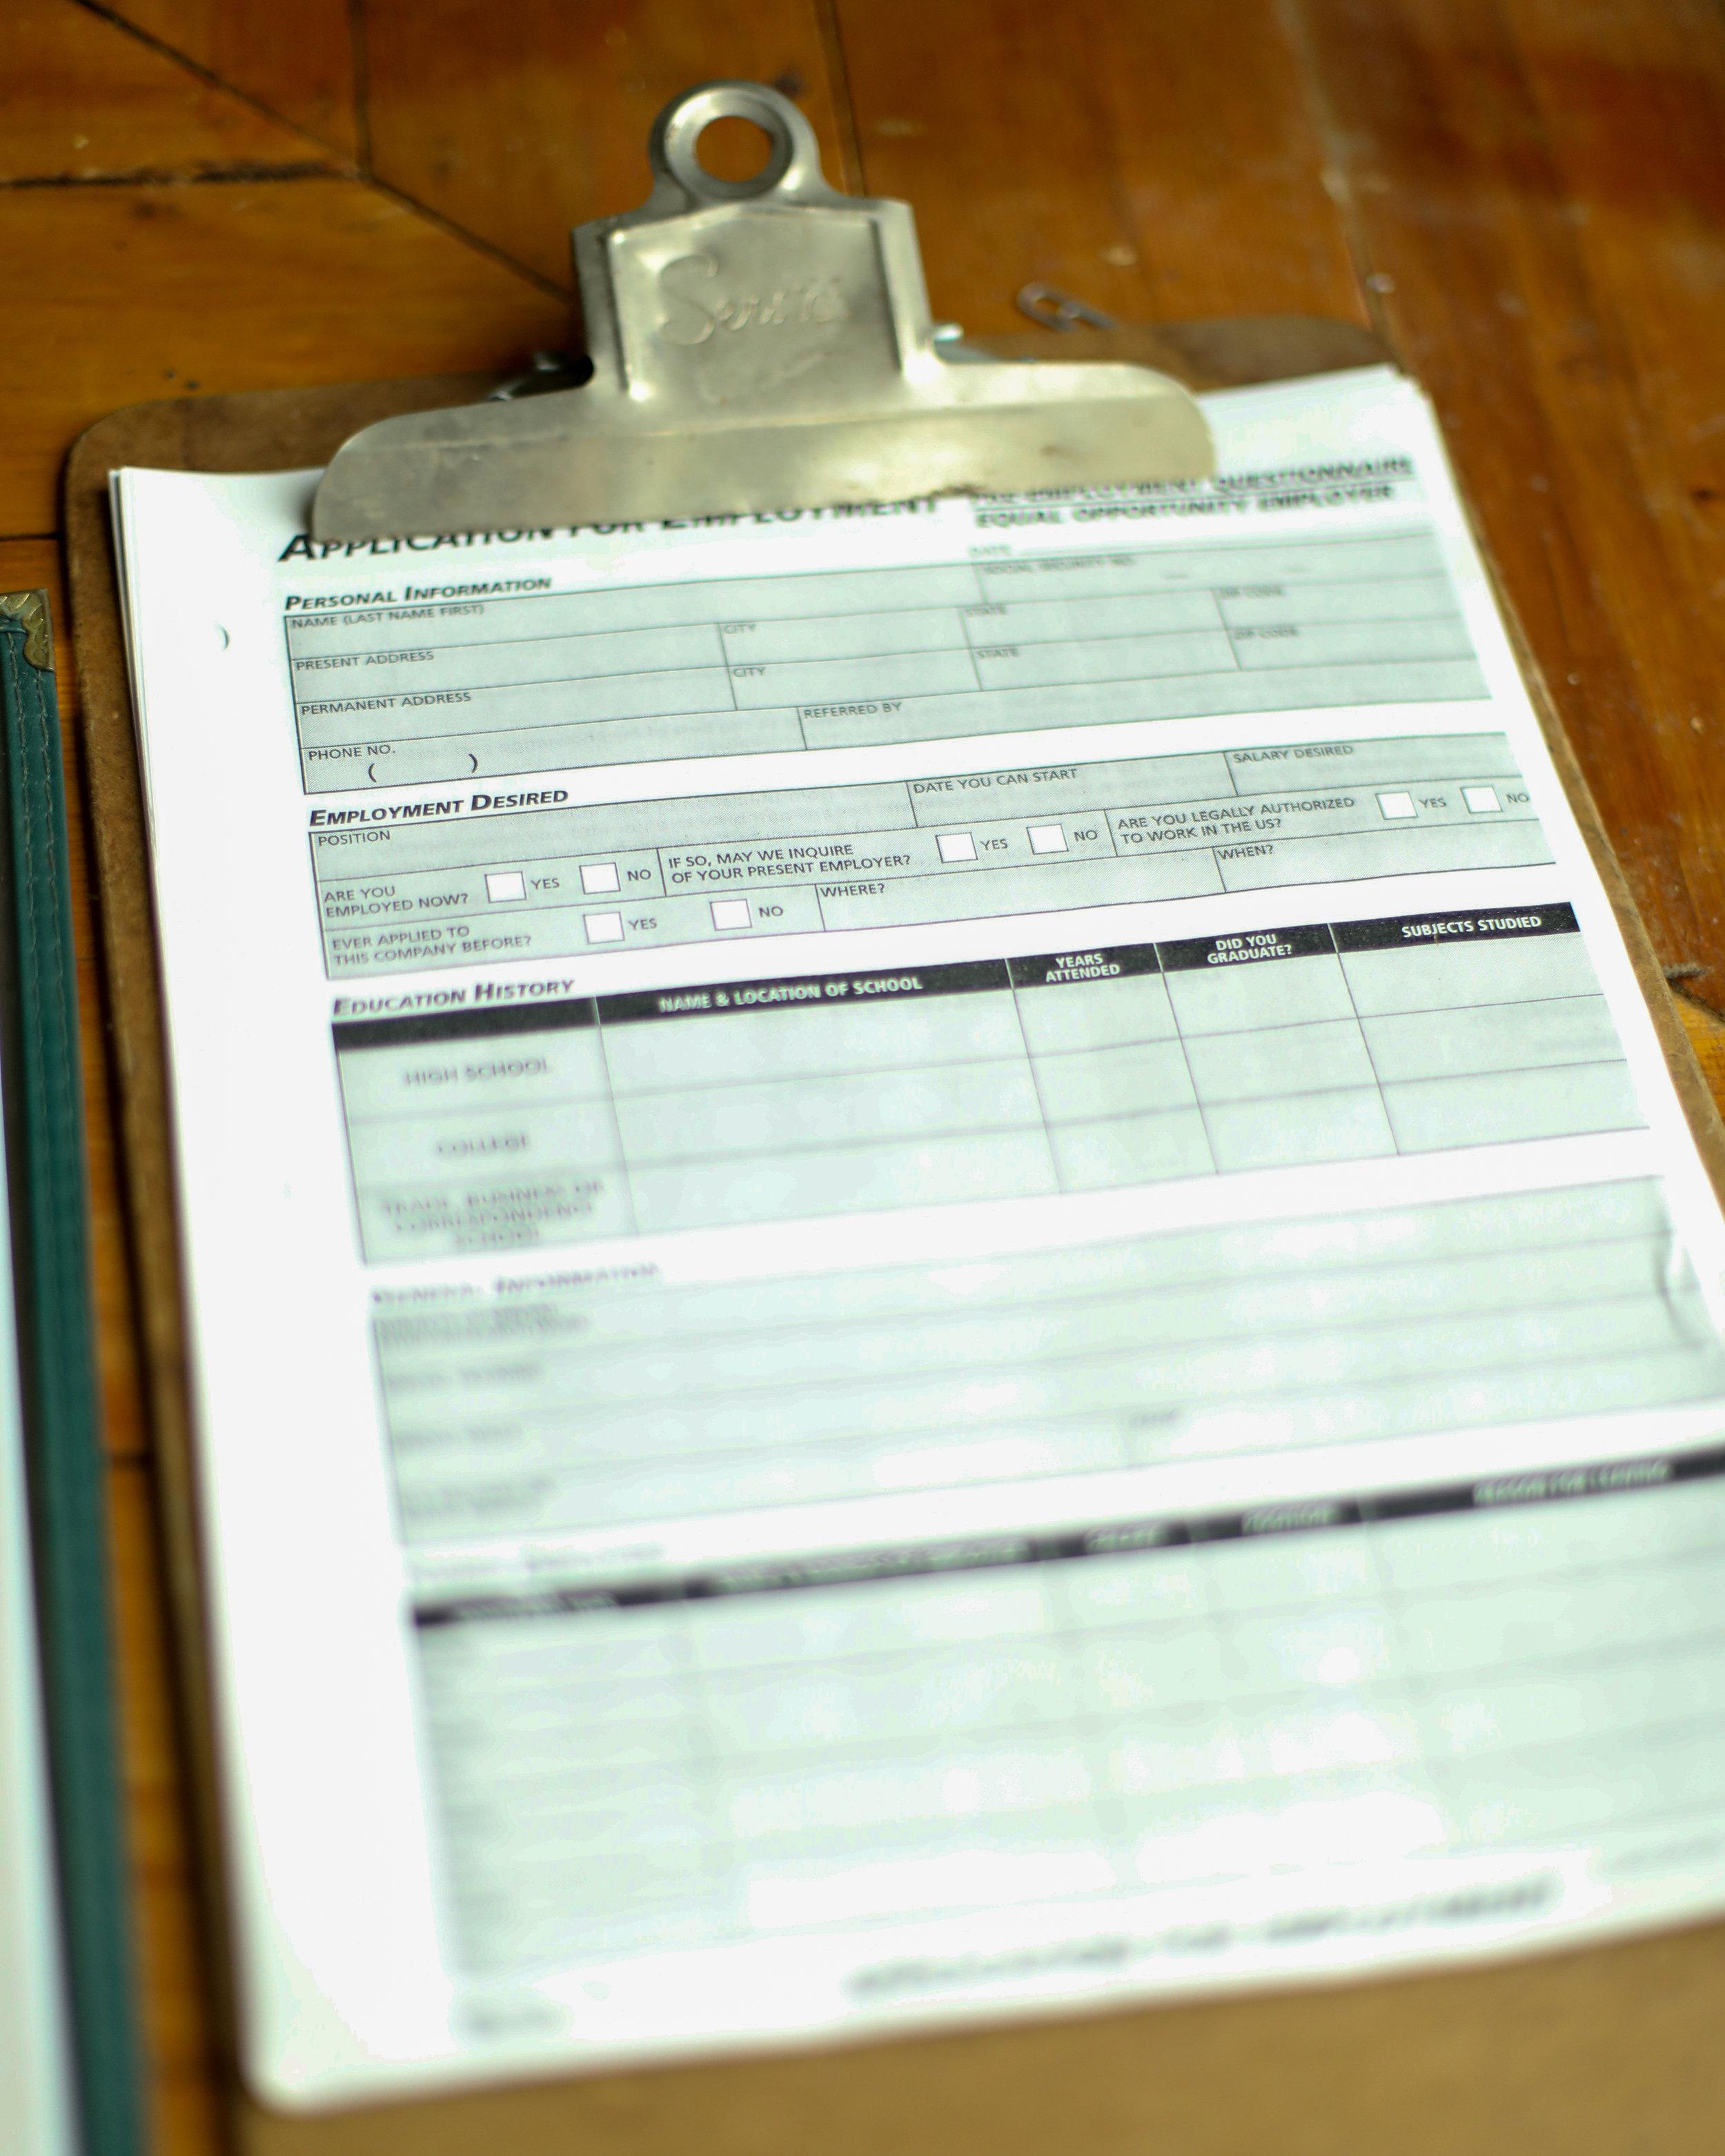 An application form on a clipboard